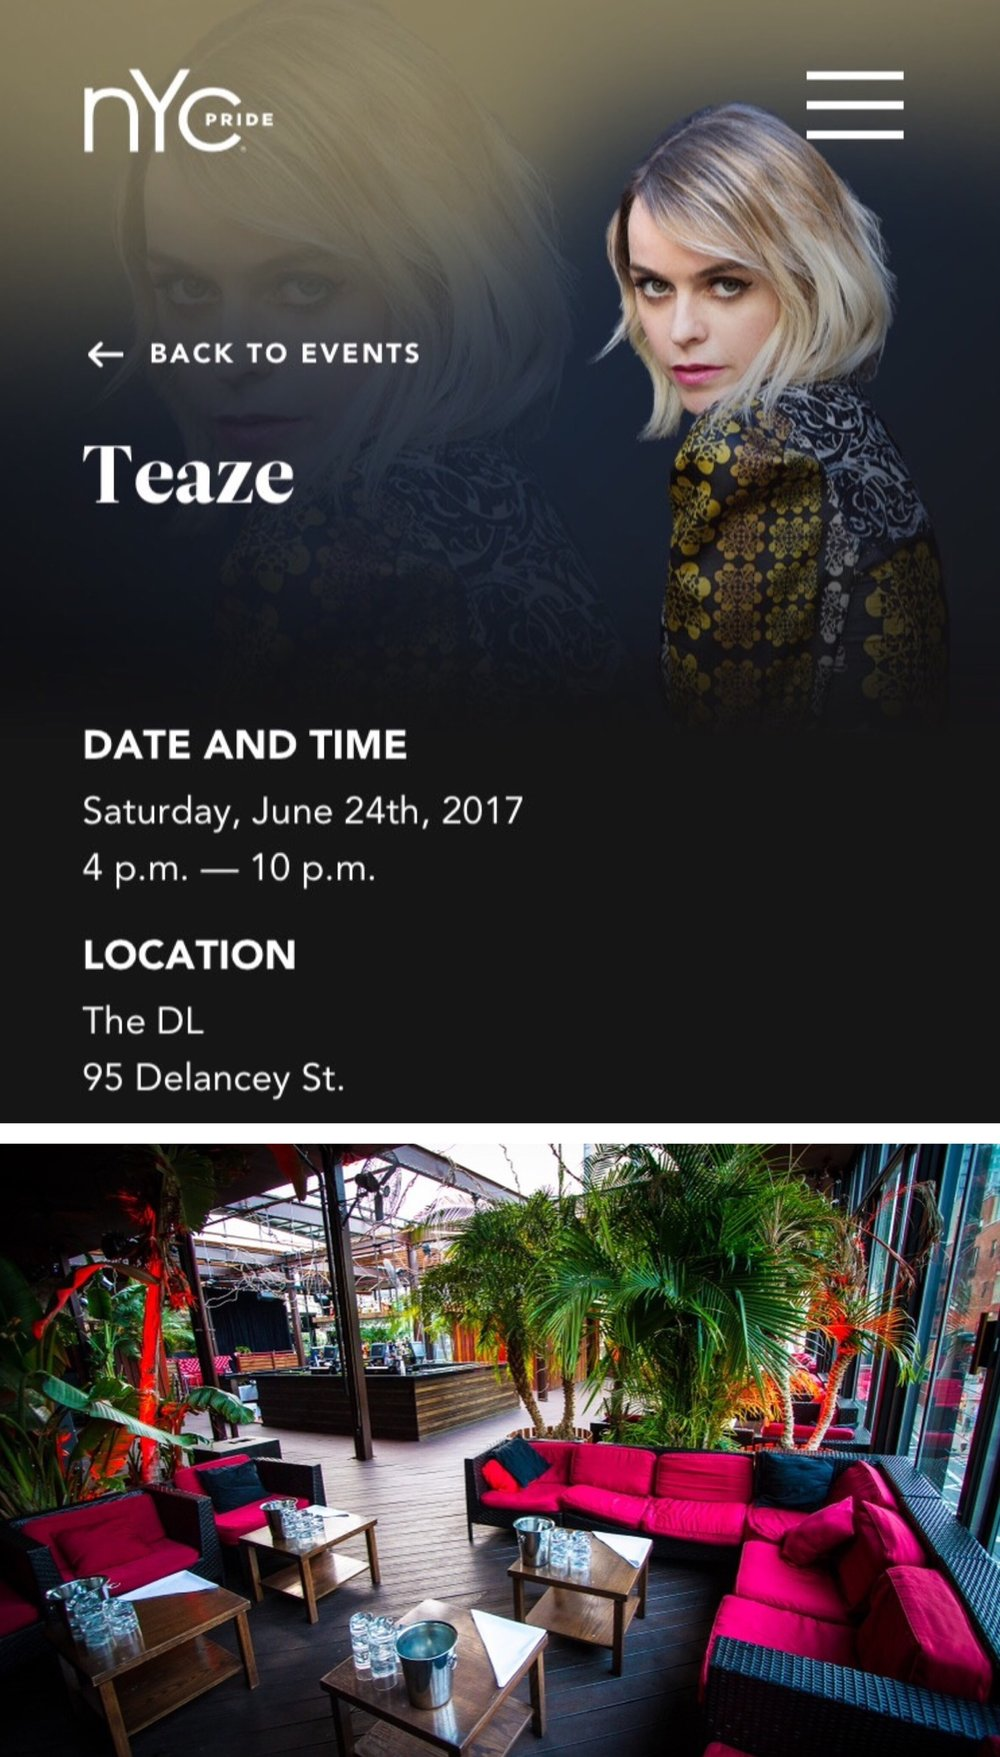 teaze.jpg